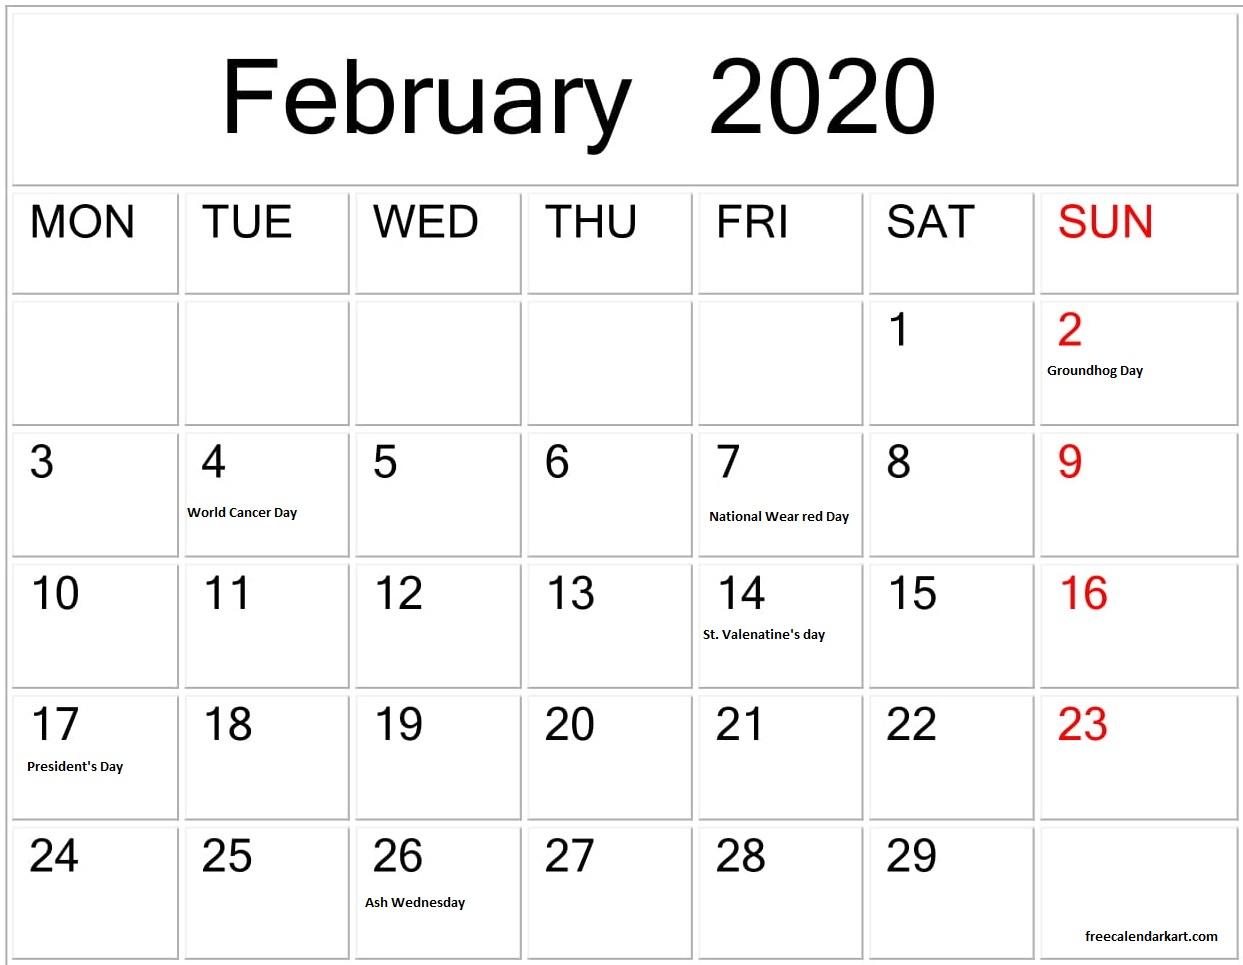 February 2020 Calendar With America Holidays